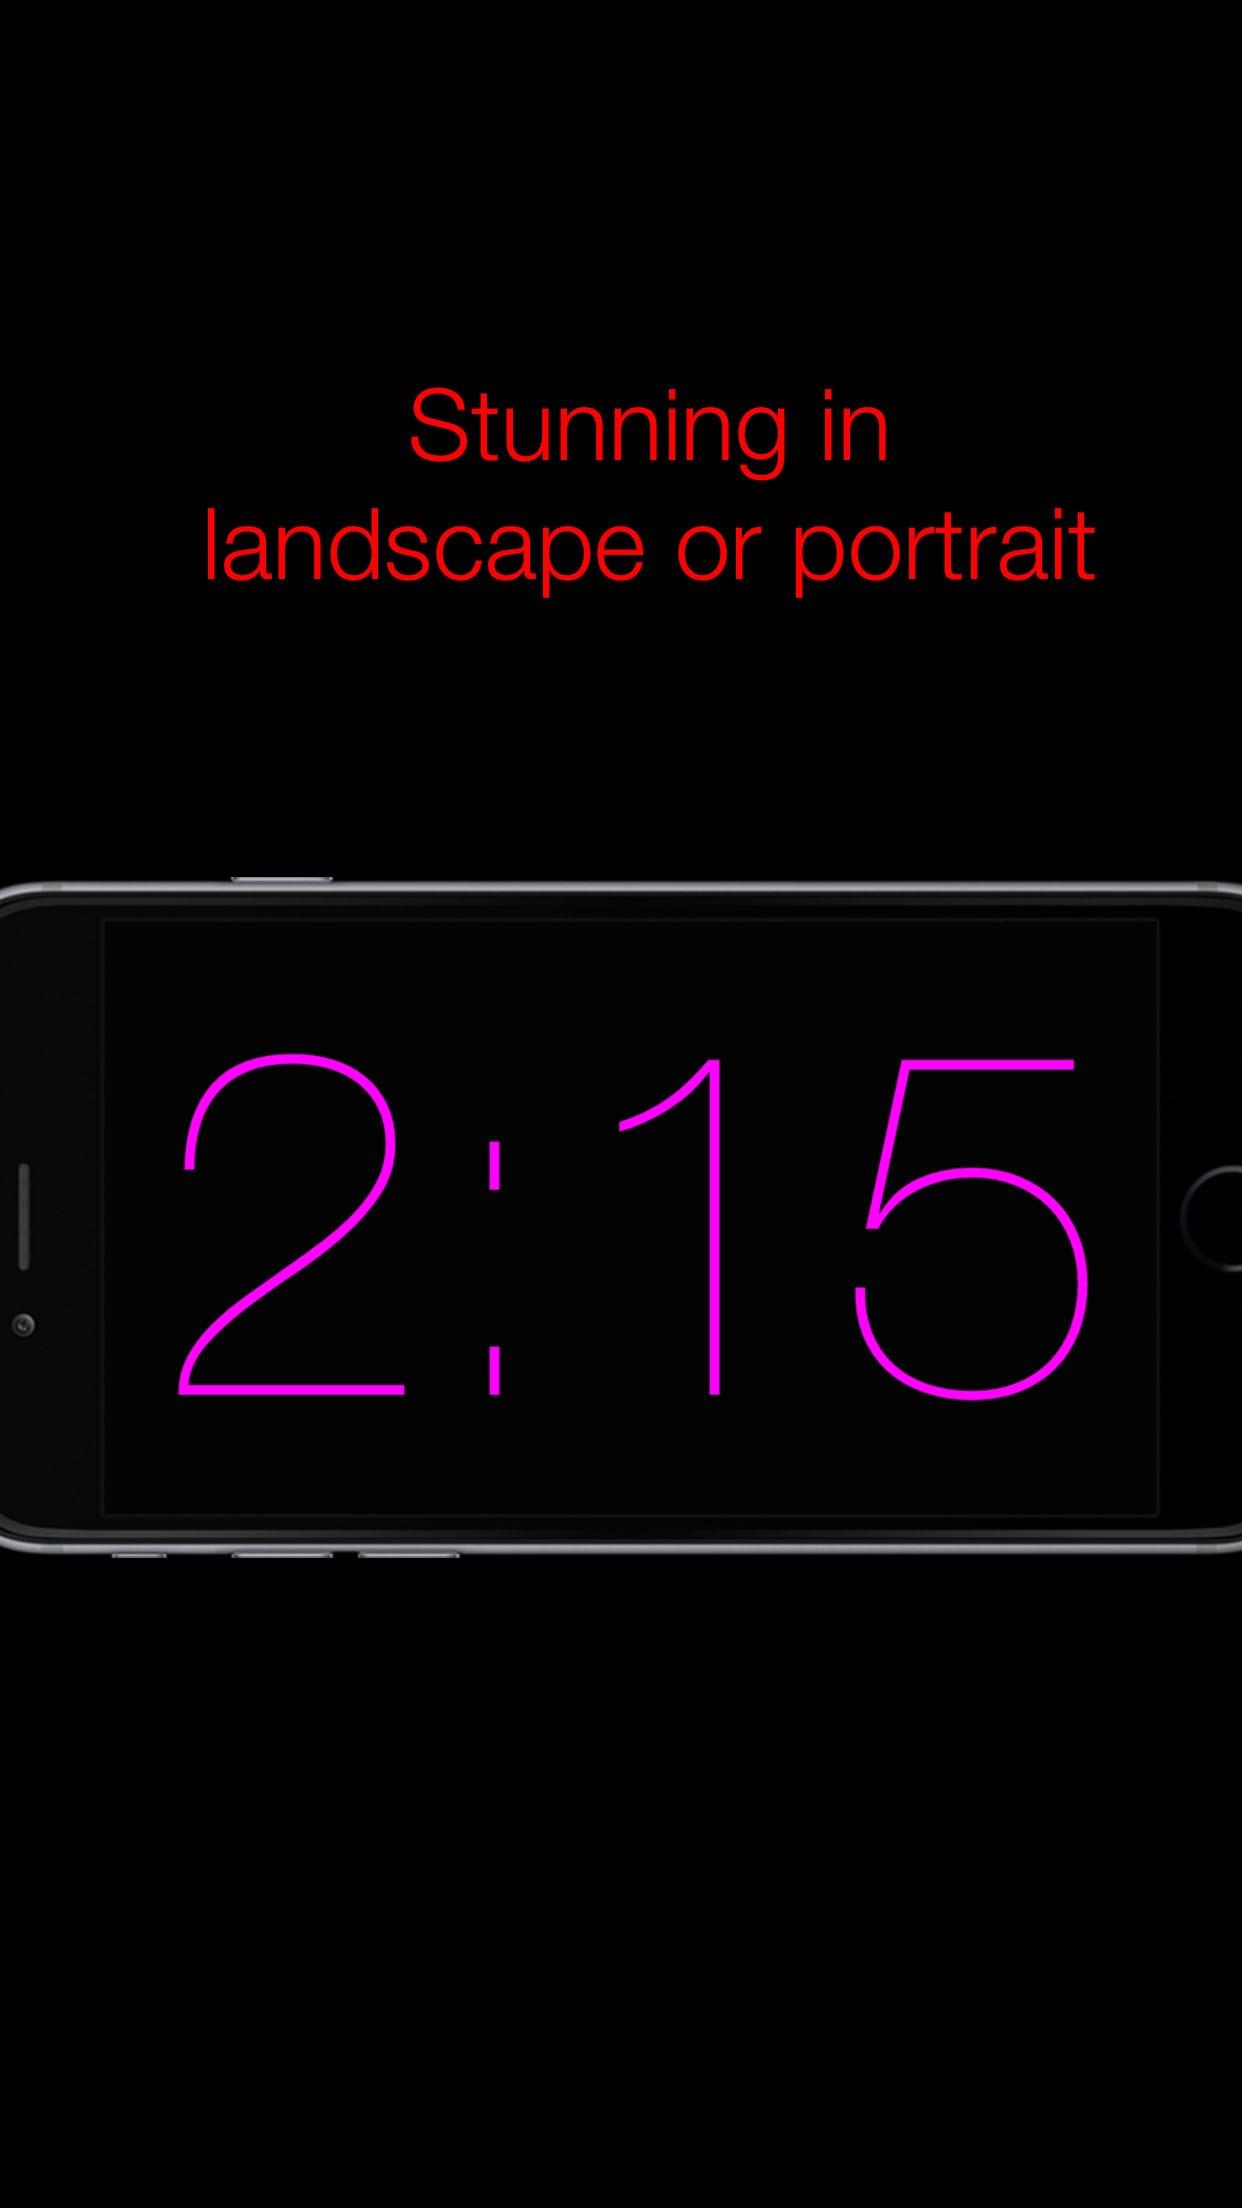 Nacht Klok - Nite Time - een eenvoudige avond klok vuoor w nachtkastje - night clock flashlight Screenshot